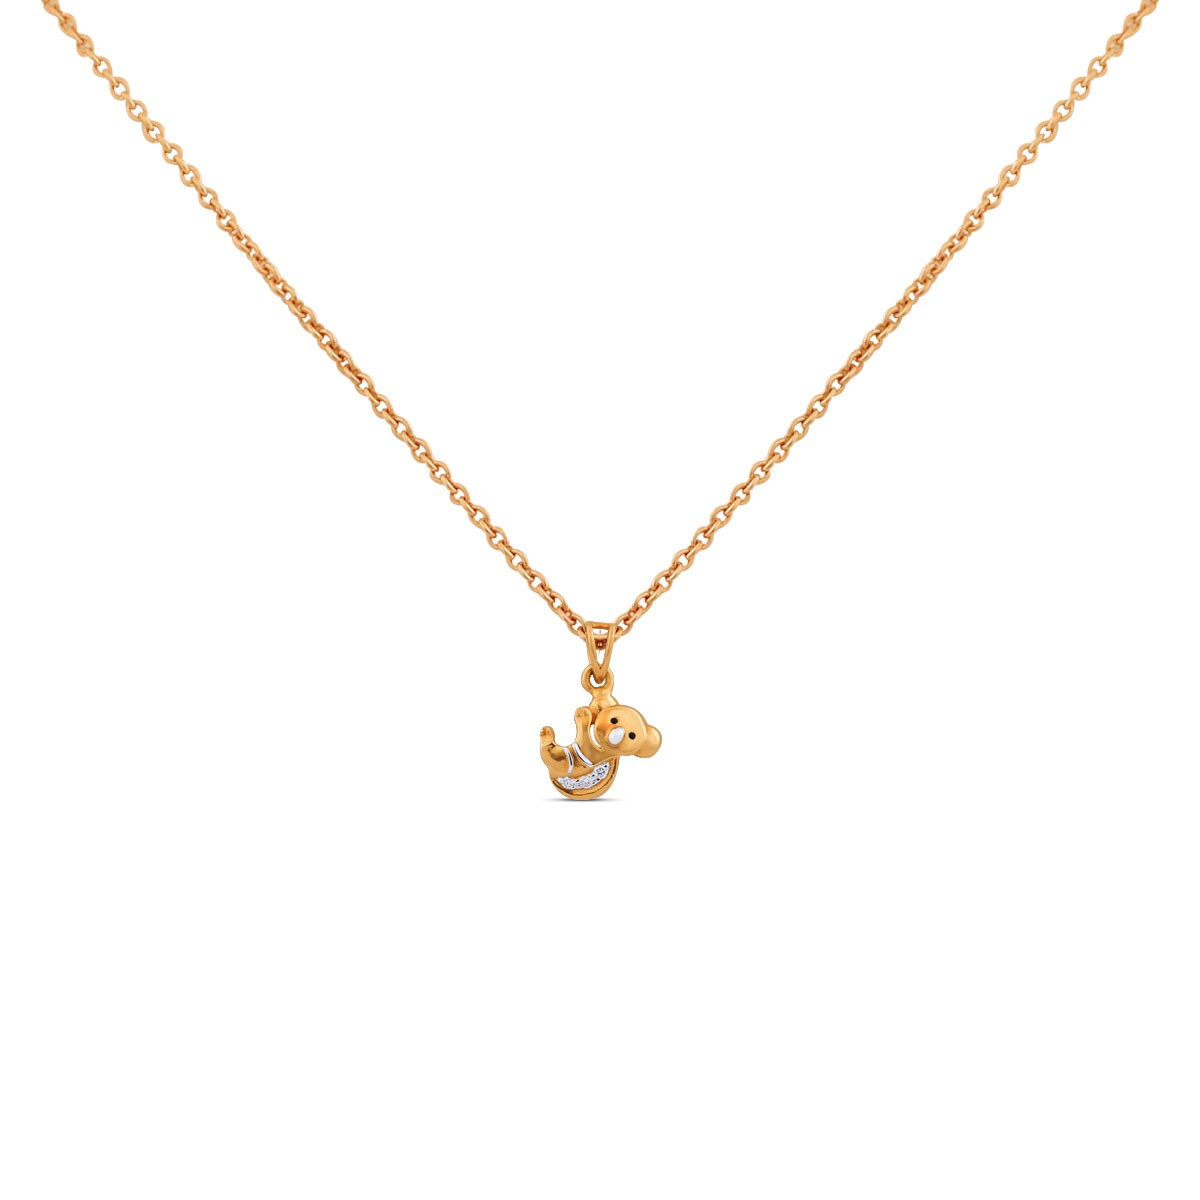 Koala Kid's Yellow Gold Diamond Pendant with Chain for Kid's